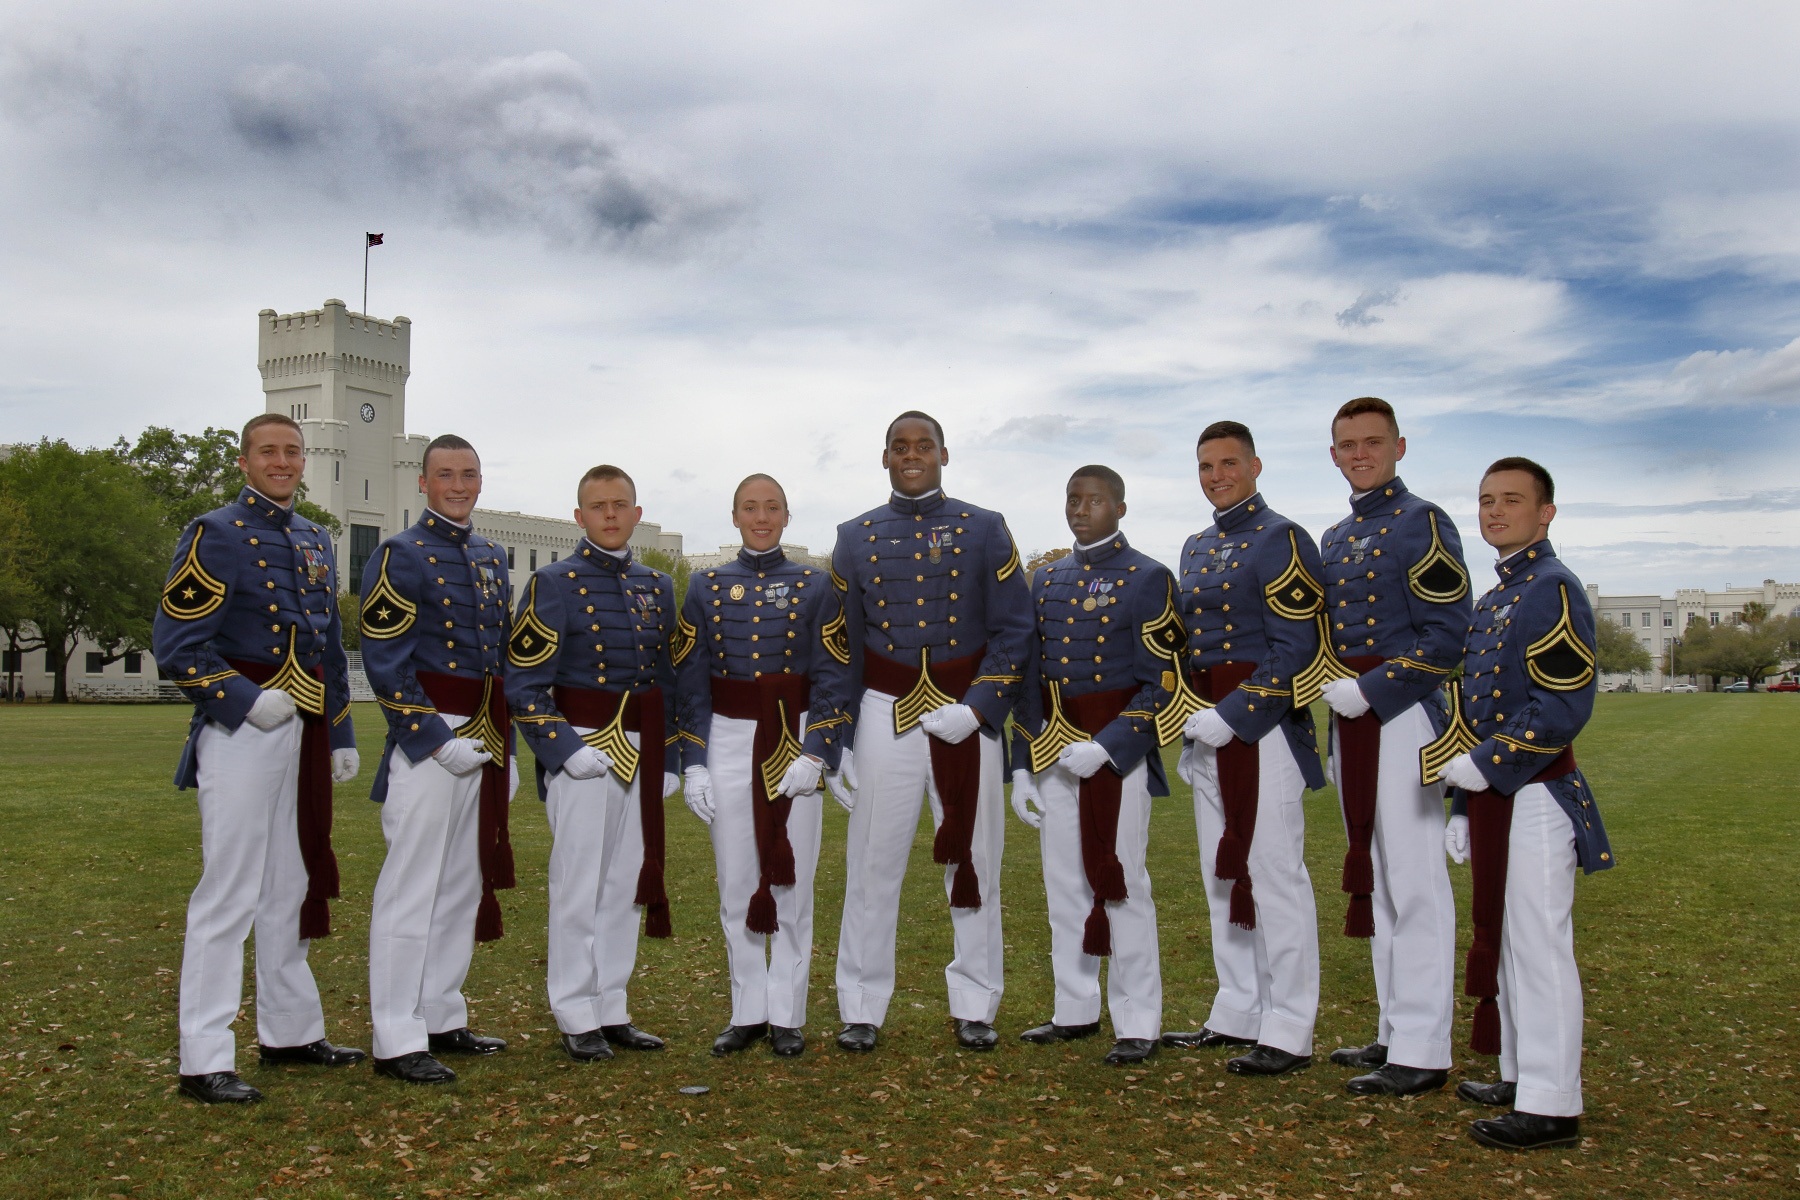 51e20fd2e The Citadel announces cadet leadership for the 2018-19 academic year